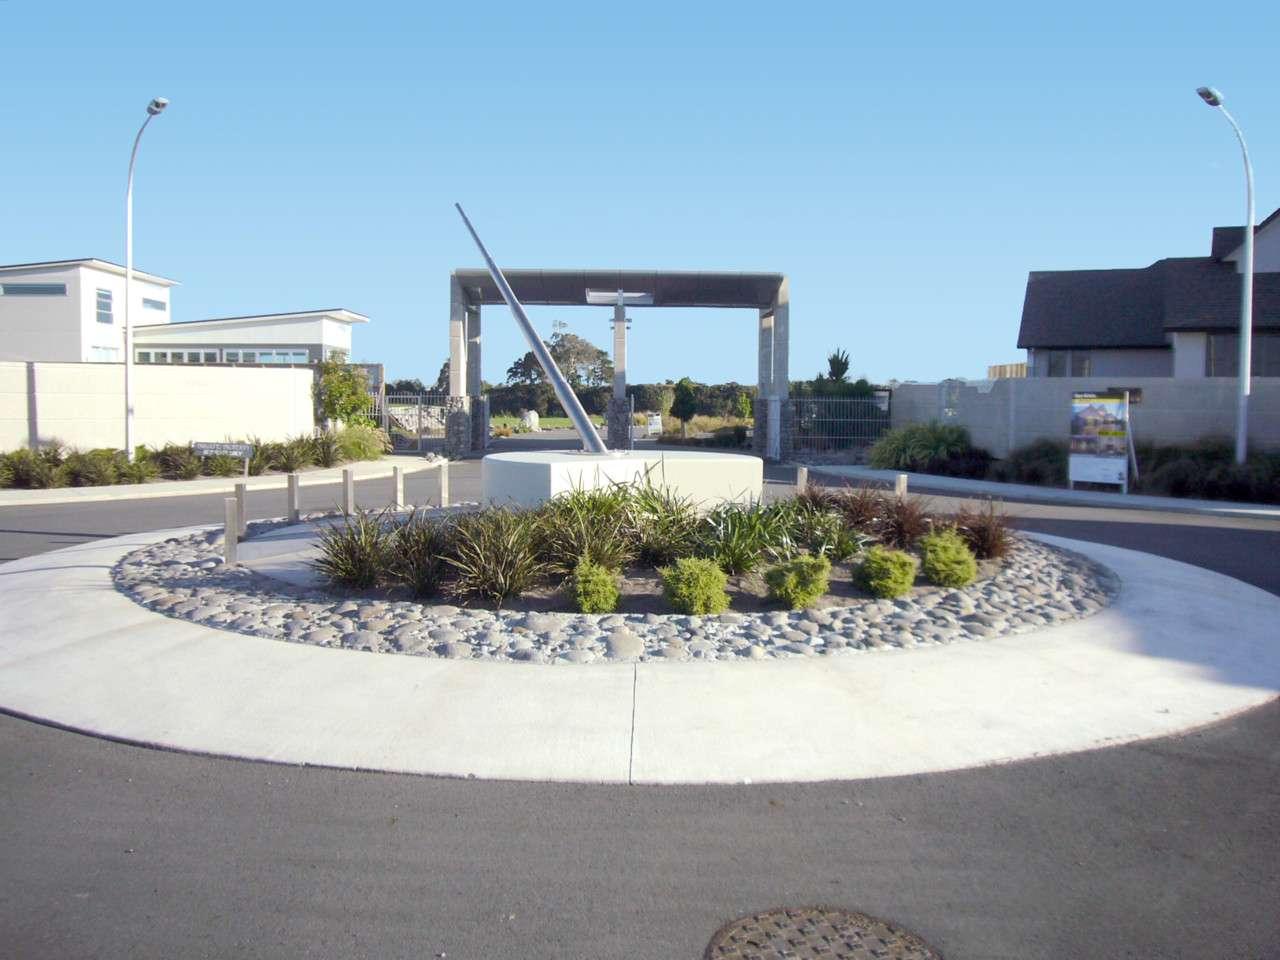 1789 River Road, Hamilton, Hamilton City 3200 - Sold Section